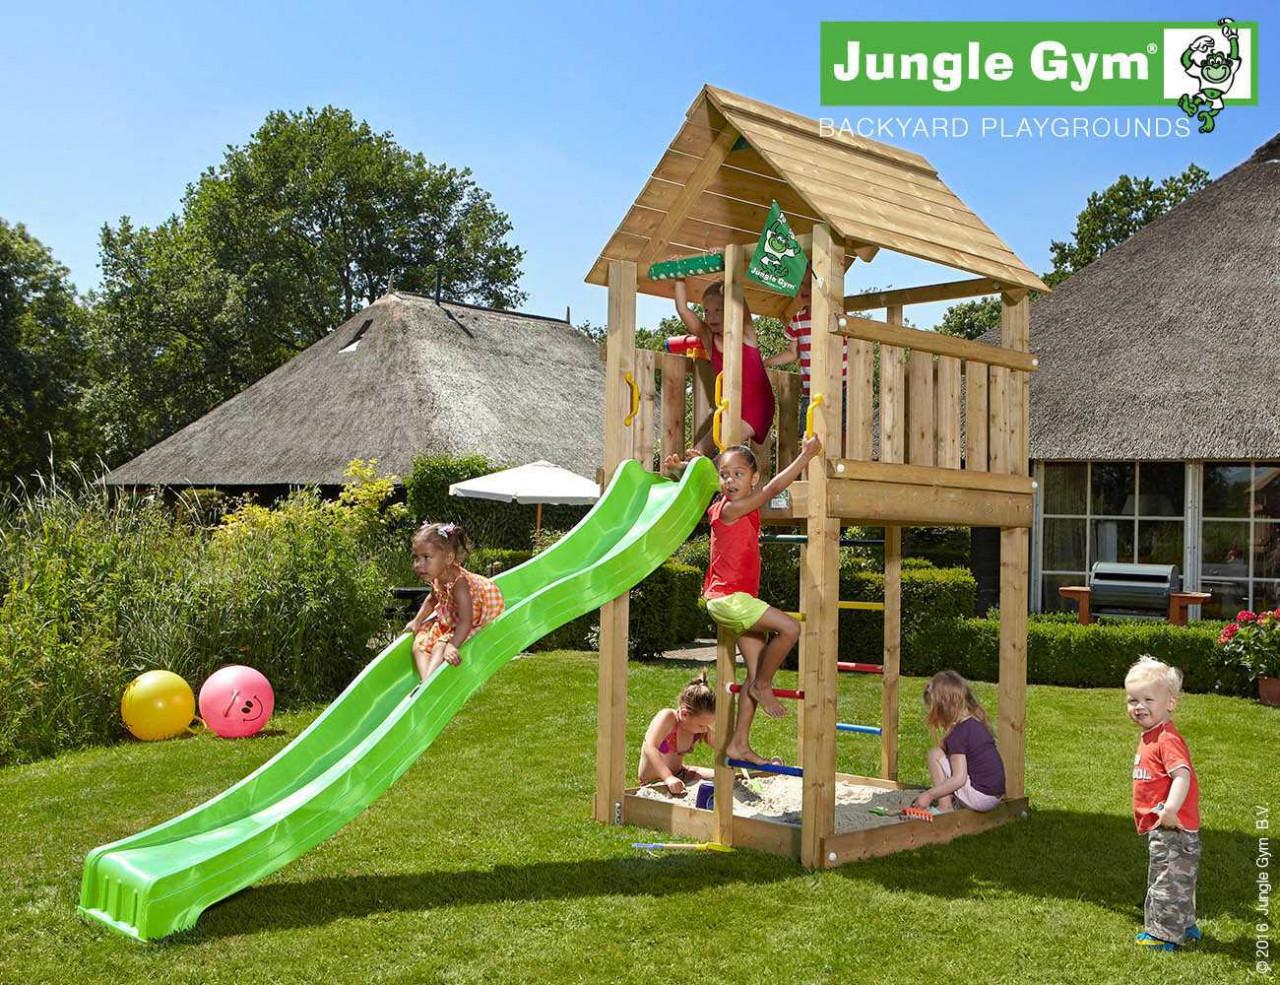 Klettergerüst Jungle Gym : Jungle gym mansion climb ab u ac preisvergleich bei idealo